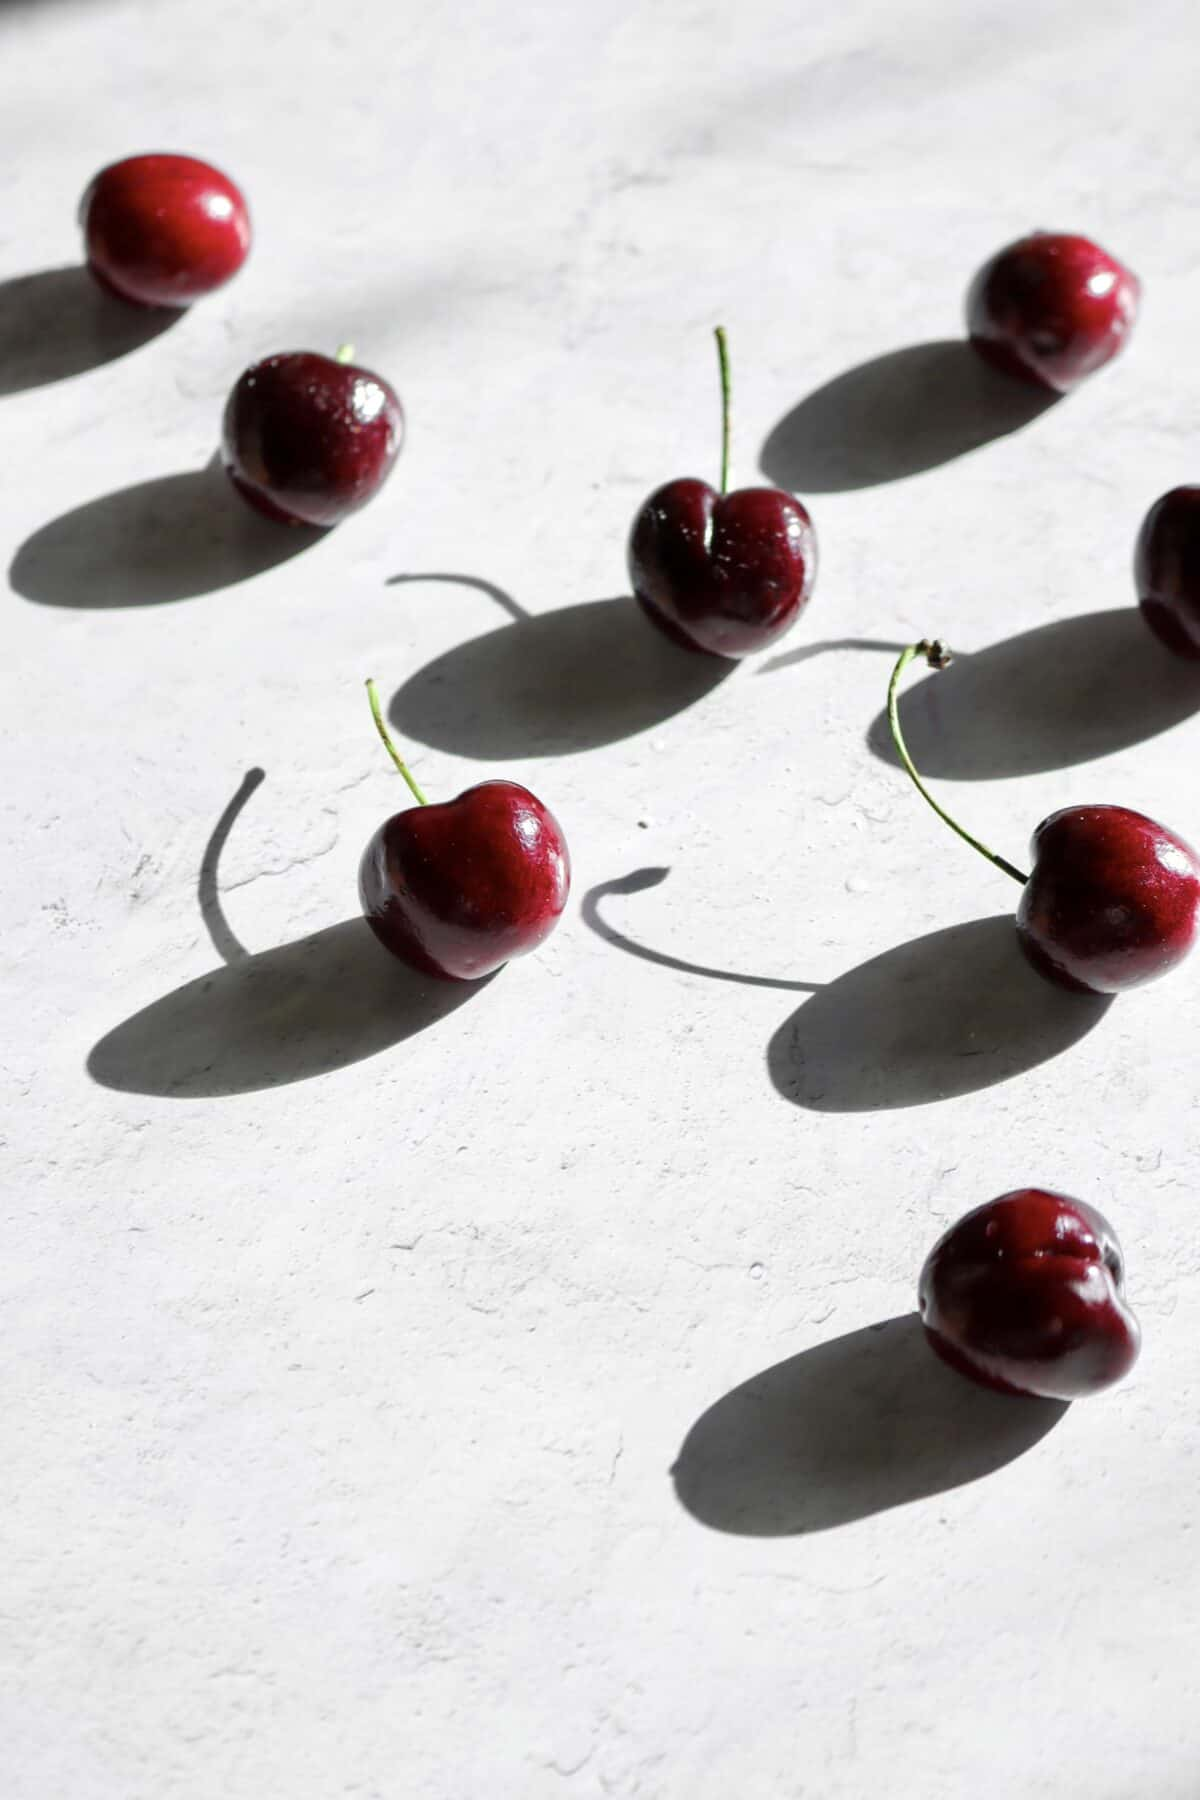 cherries on a concrete board